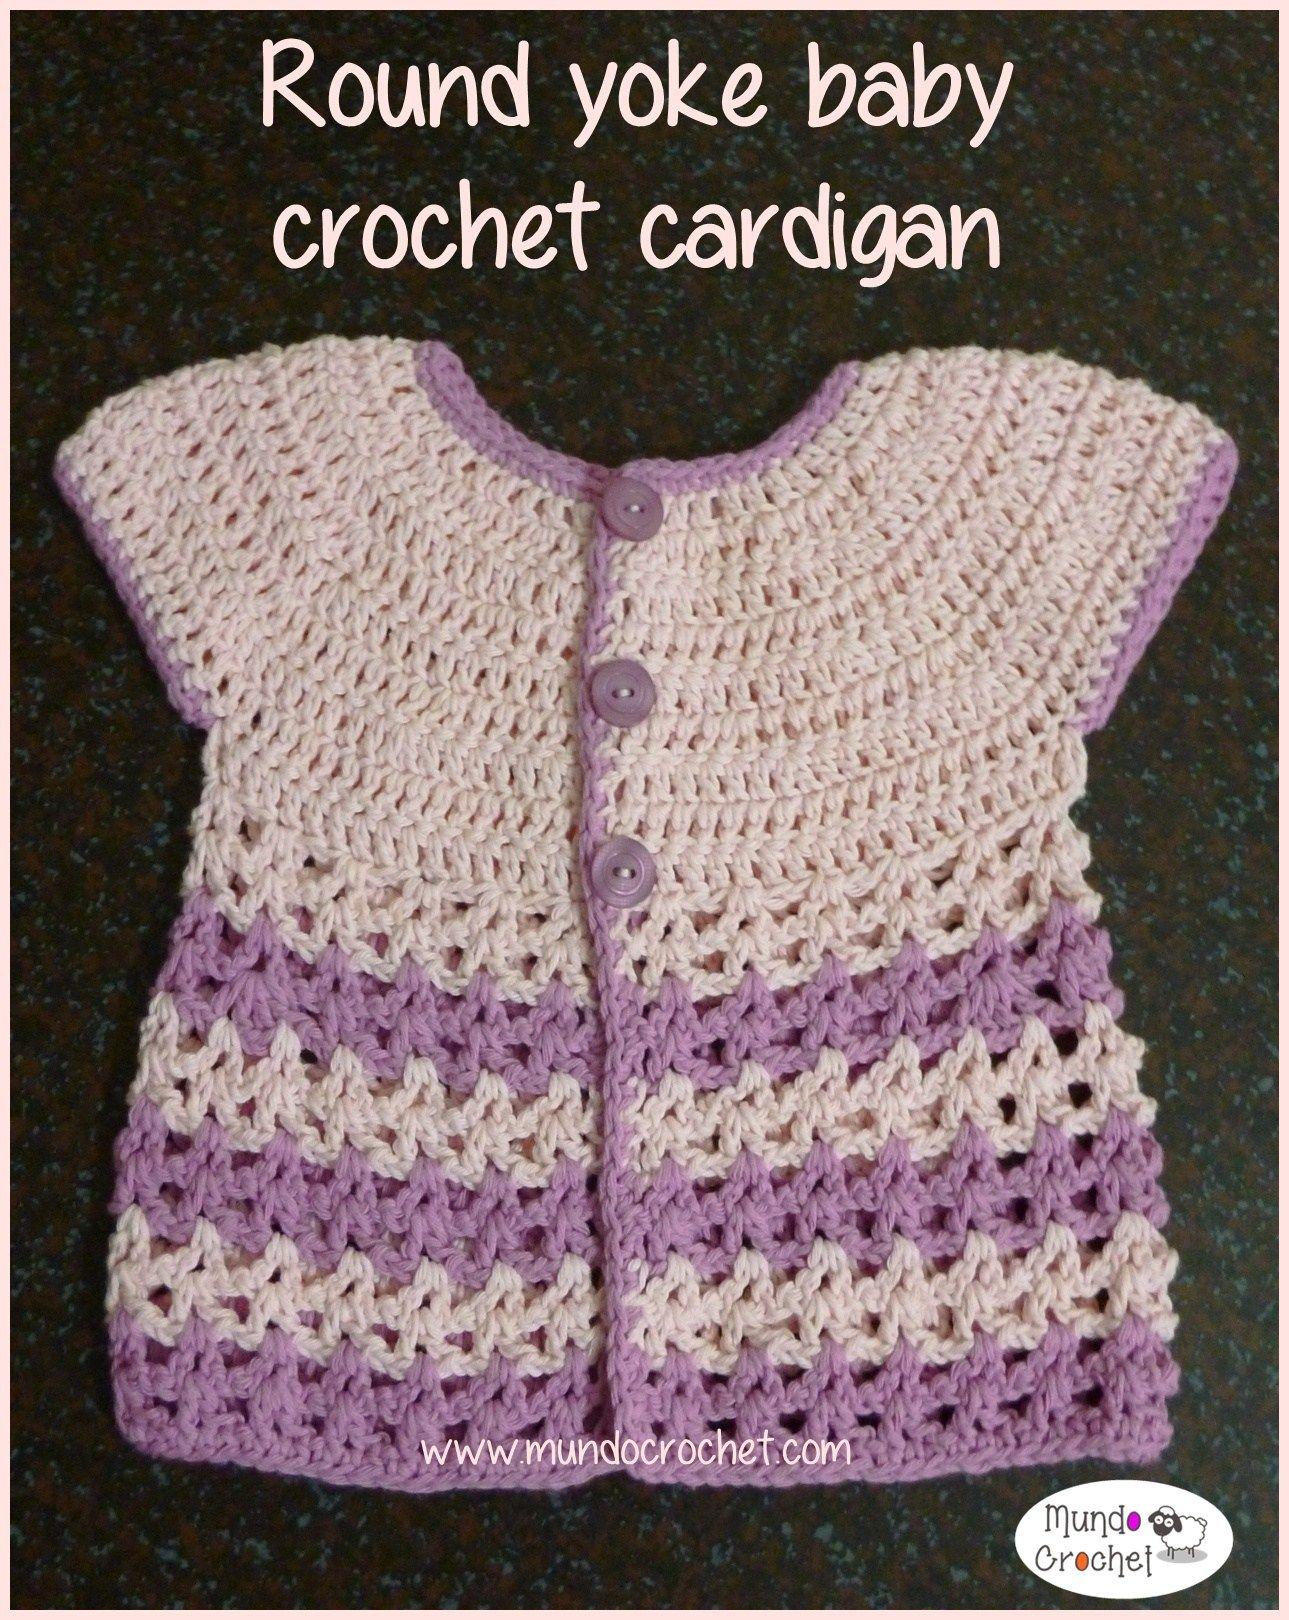 Round yoke baby crochet cardigan free pattern and tutorial | Easy ...